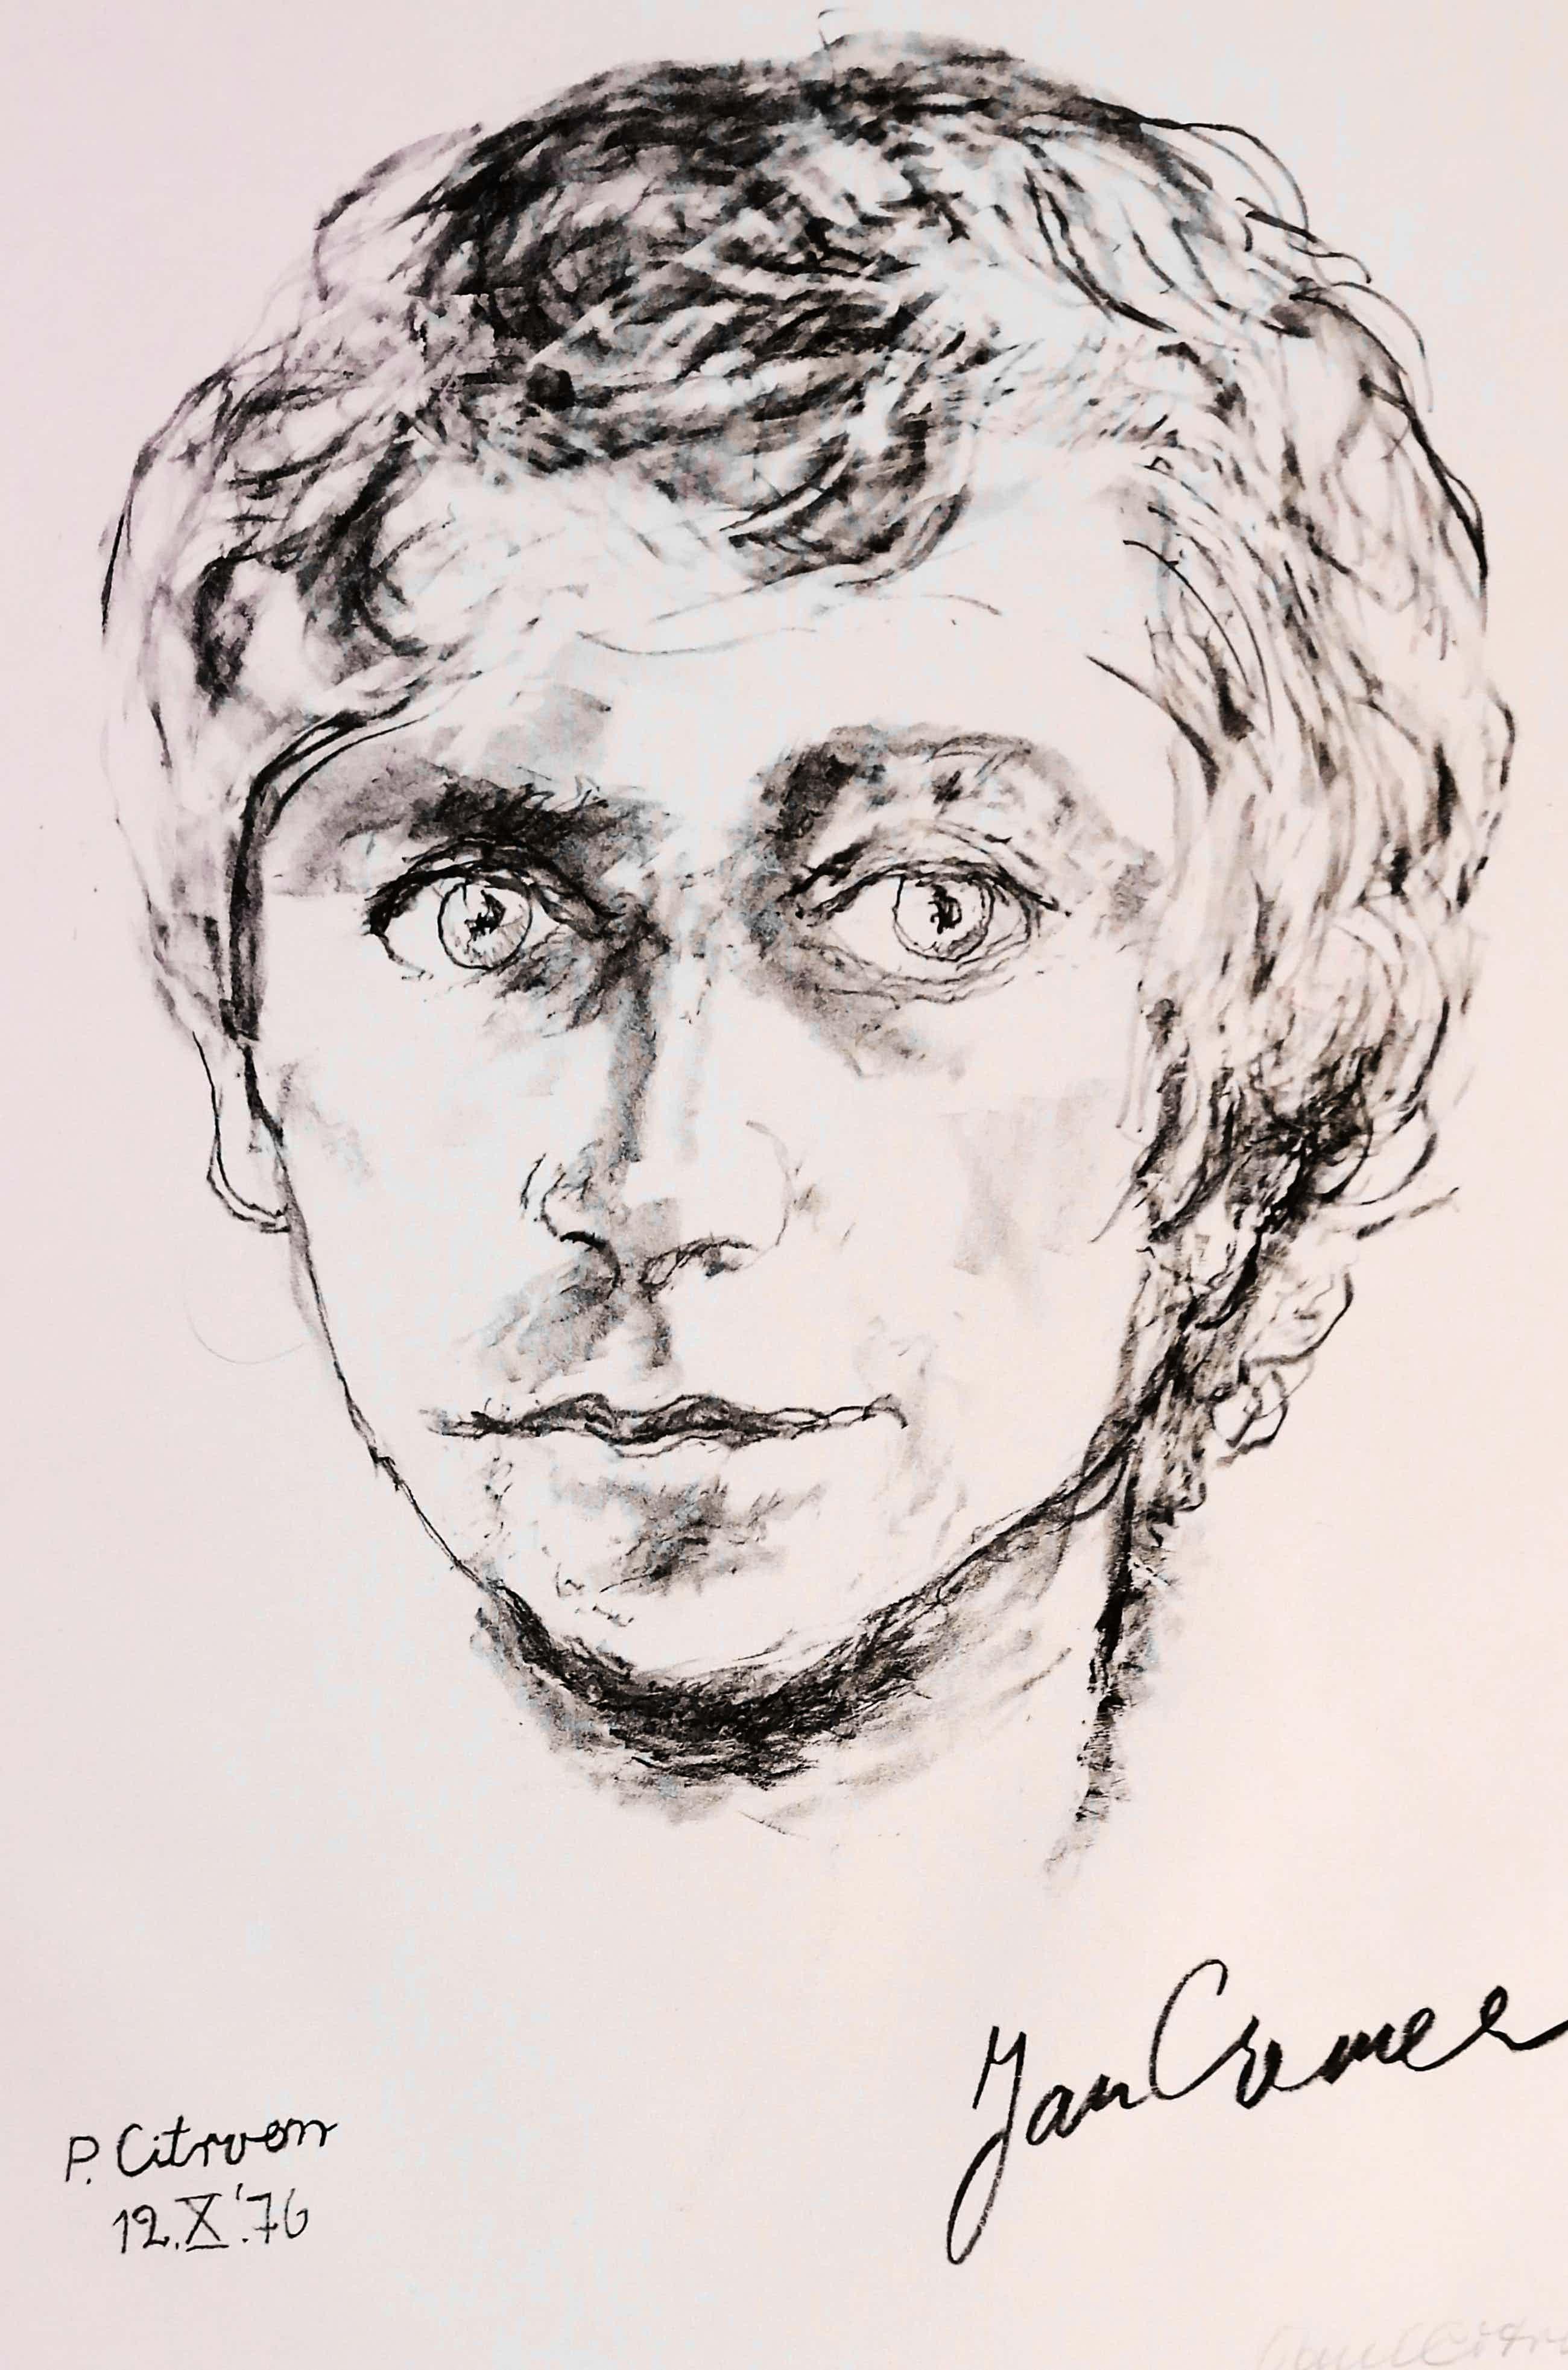 Paul Citroen - Portret van Jan Cremer kopen? Bied vanaf 60!